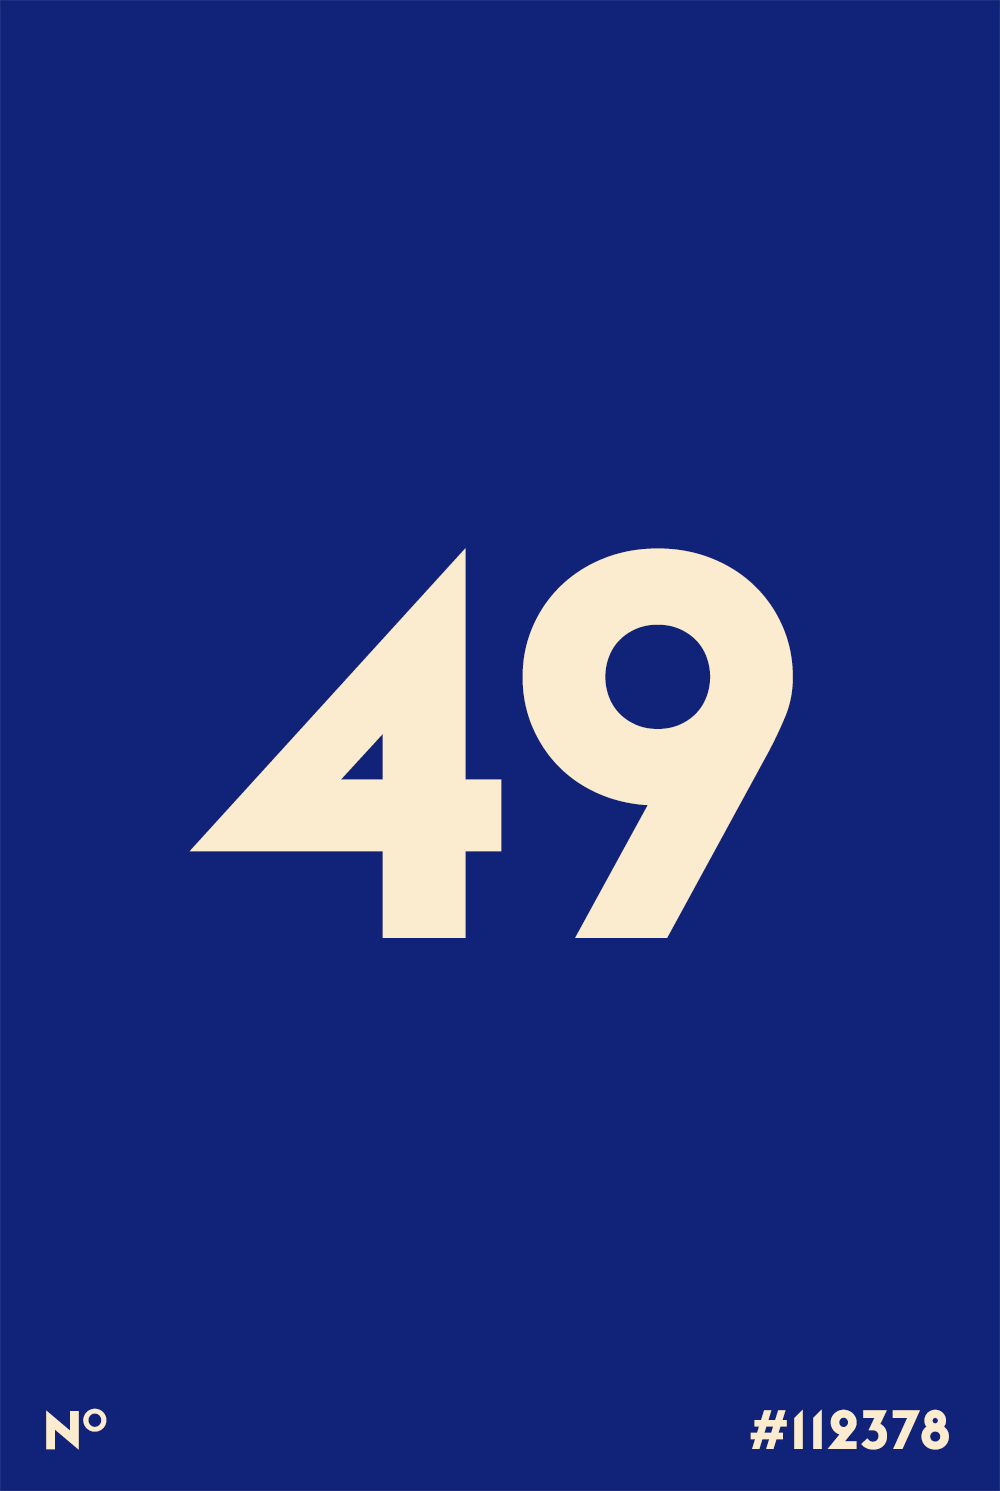 cc_0048_49